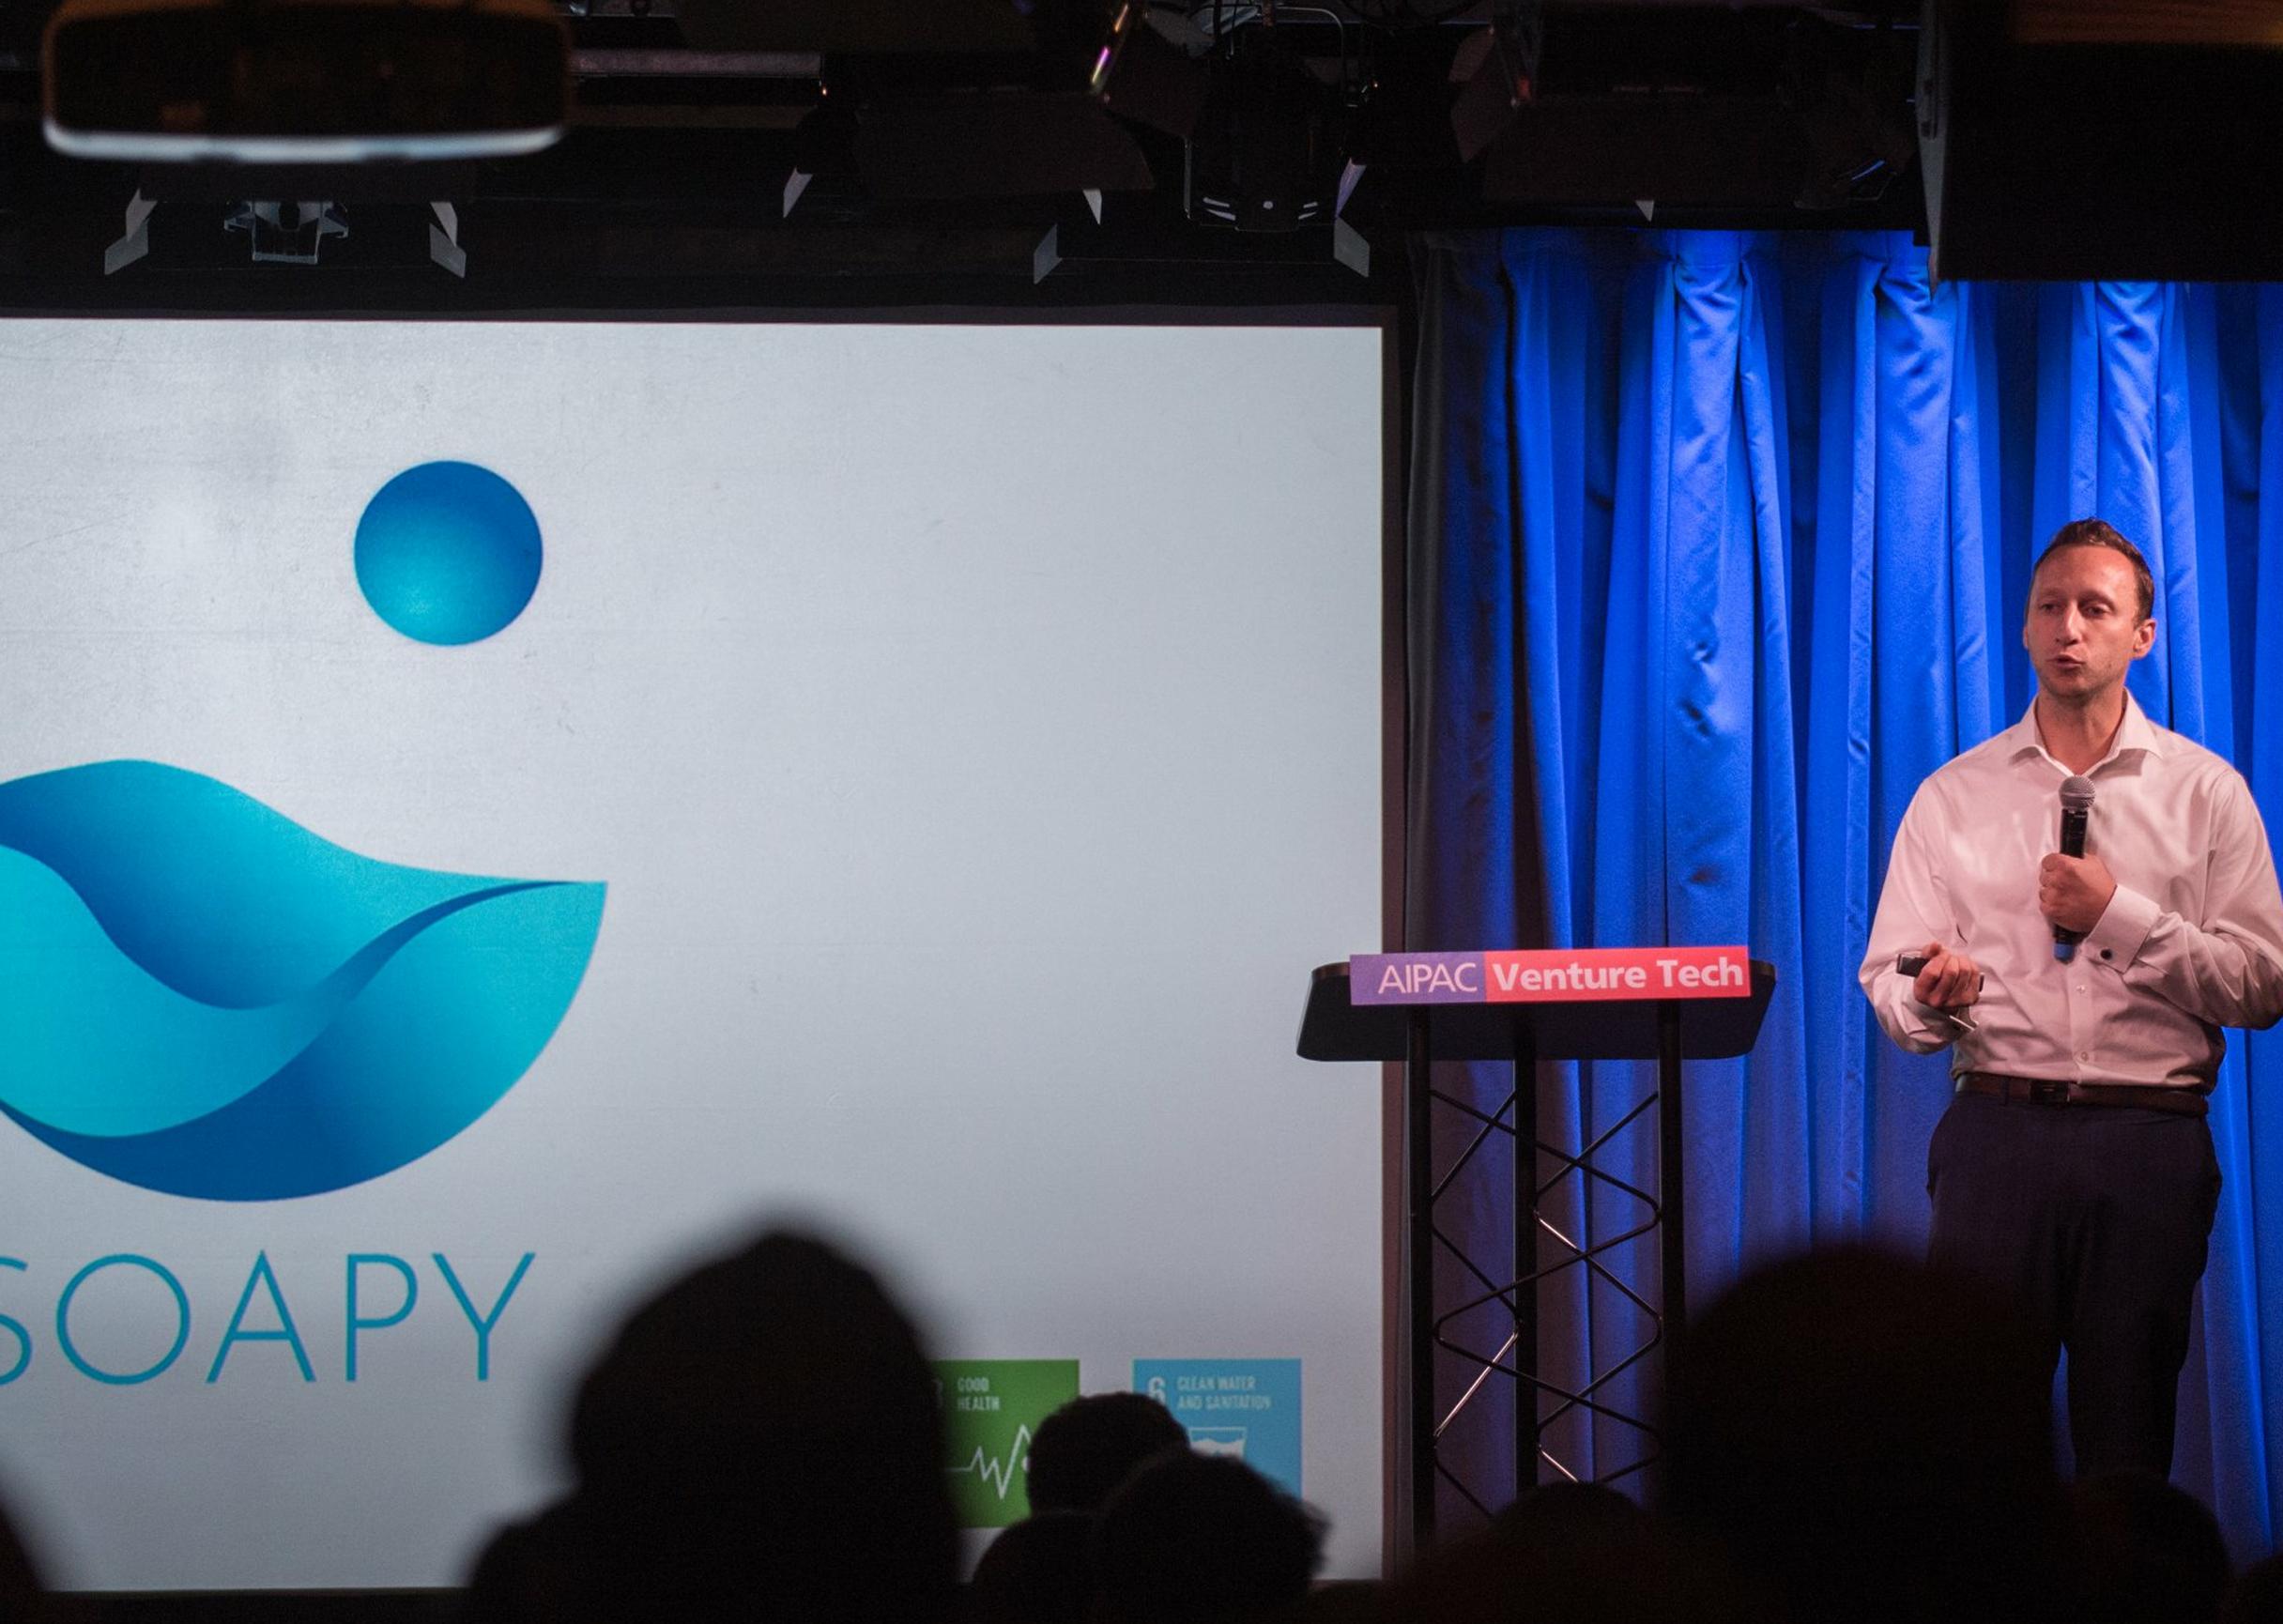 8200 Impact alumnus Soapy CEO Max Simonovsky